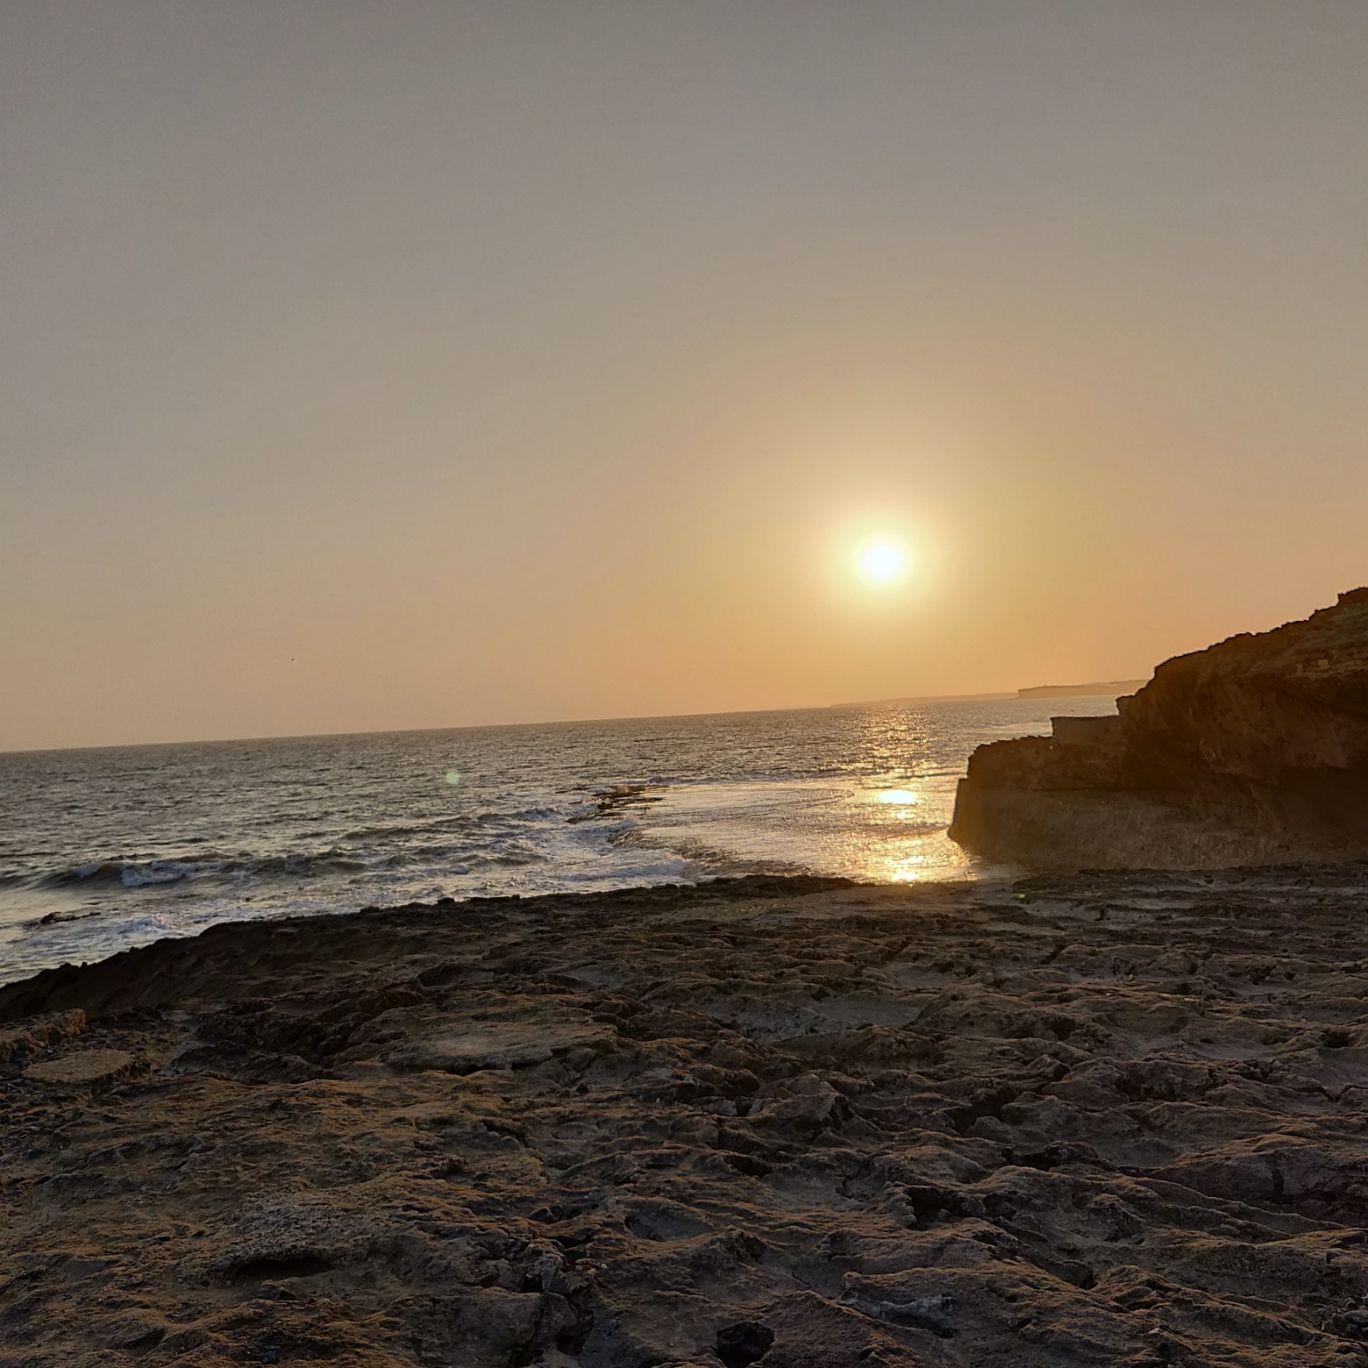 Photo of INS khukari sunset point By Chandan Kumar Singh